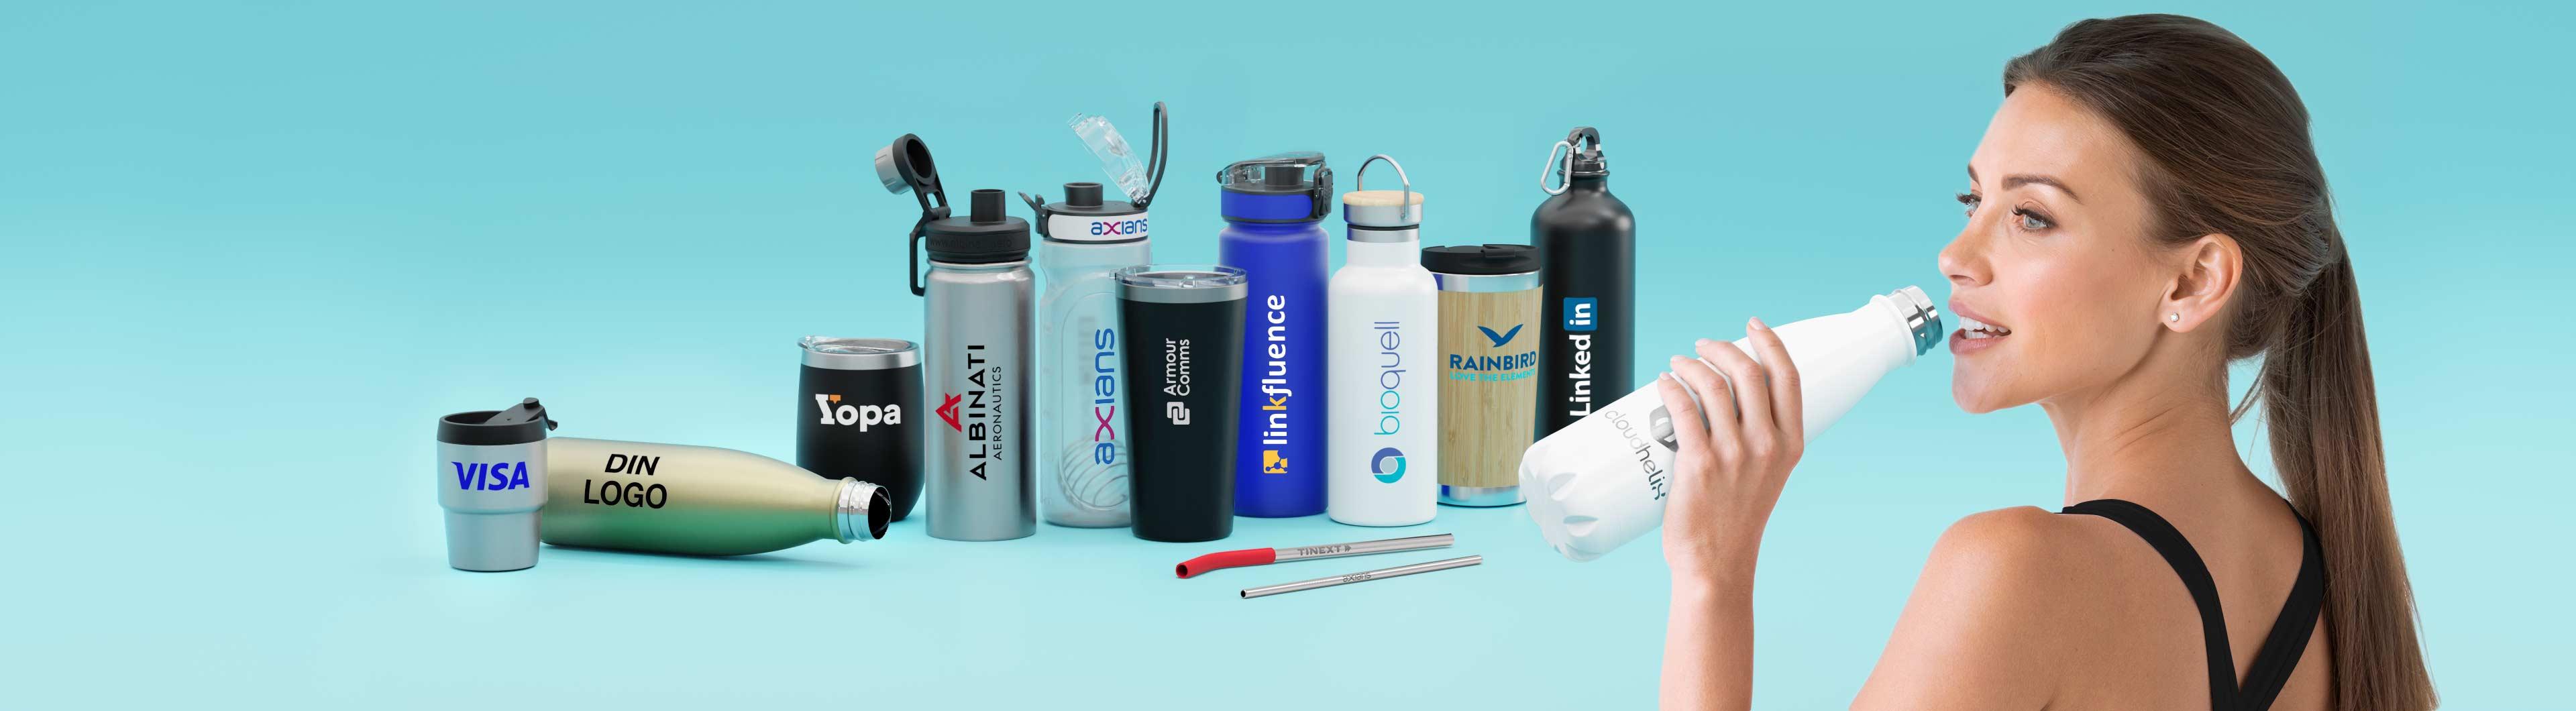 Flasky - Skreddersydde vannflasker